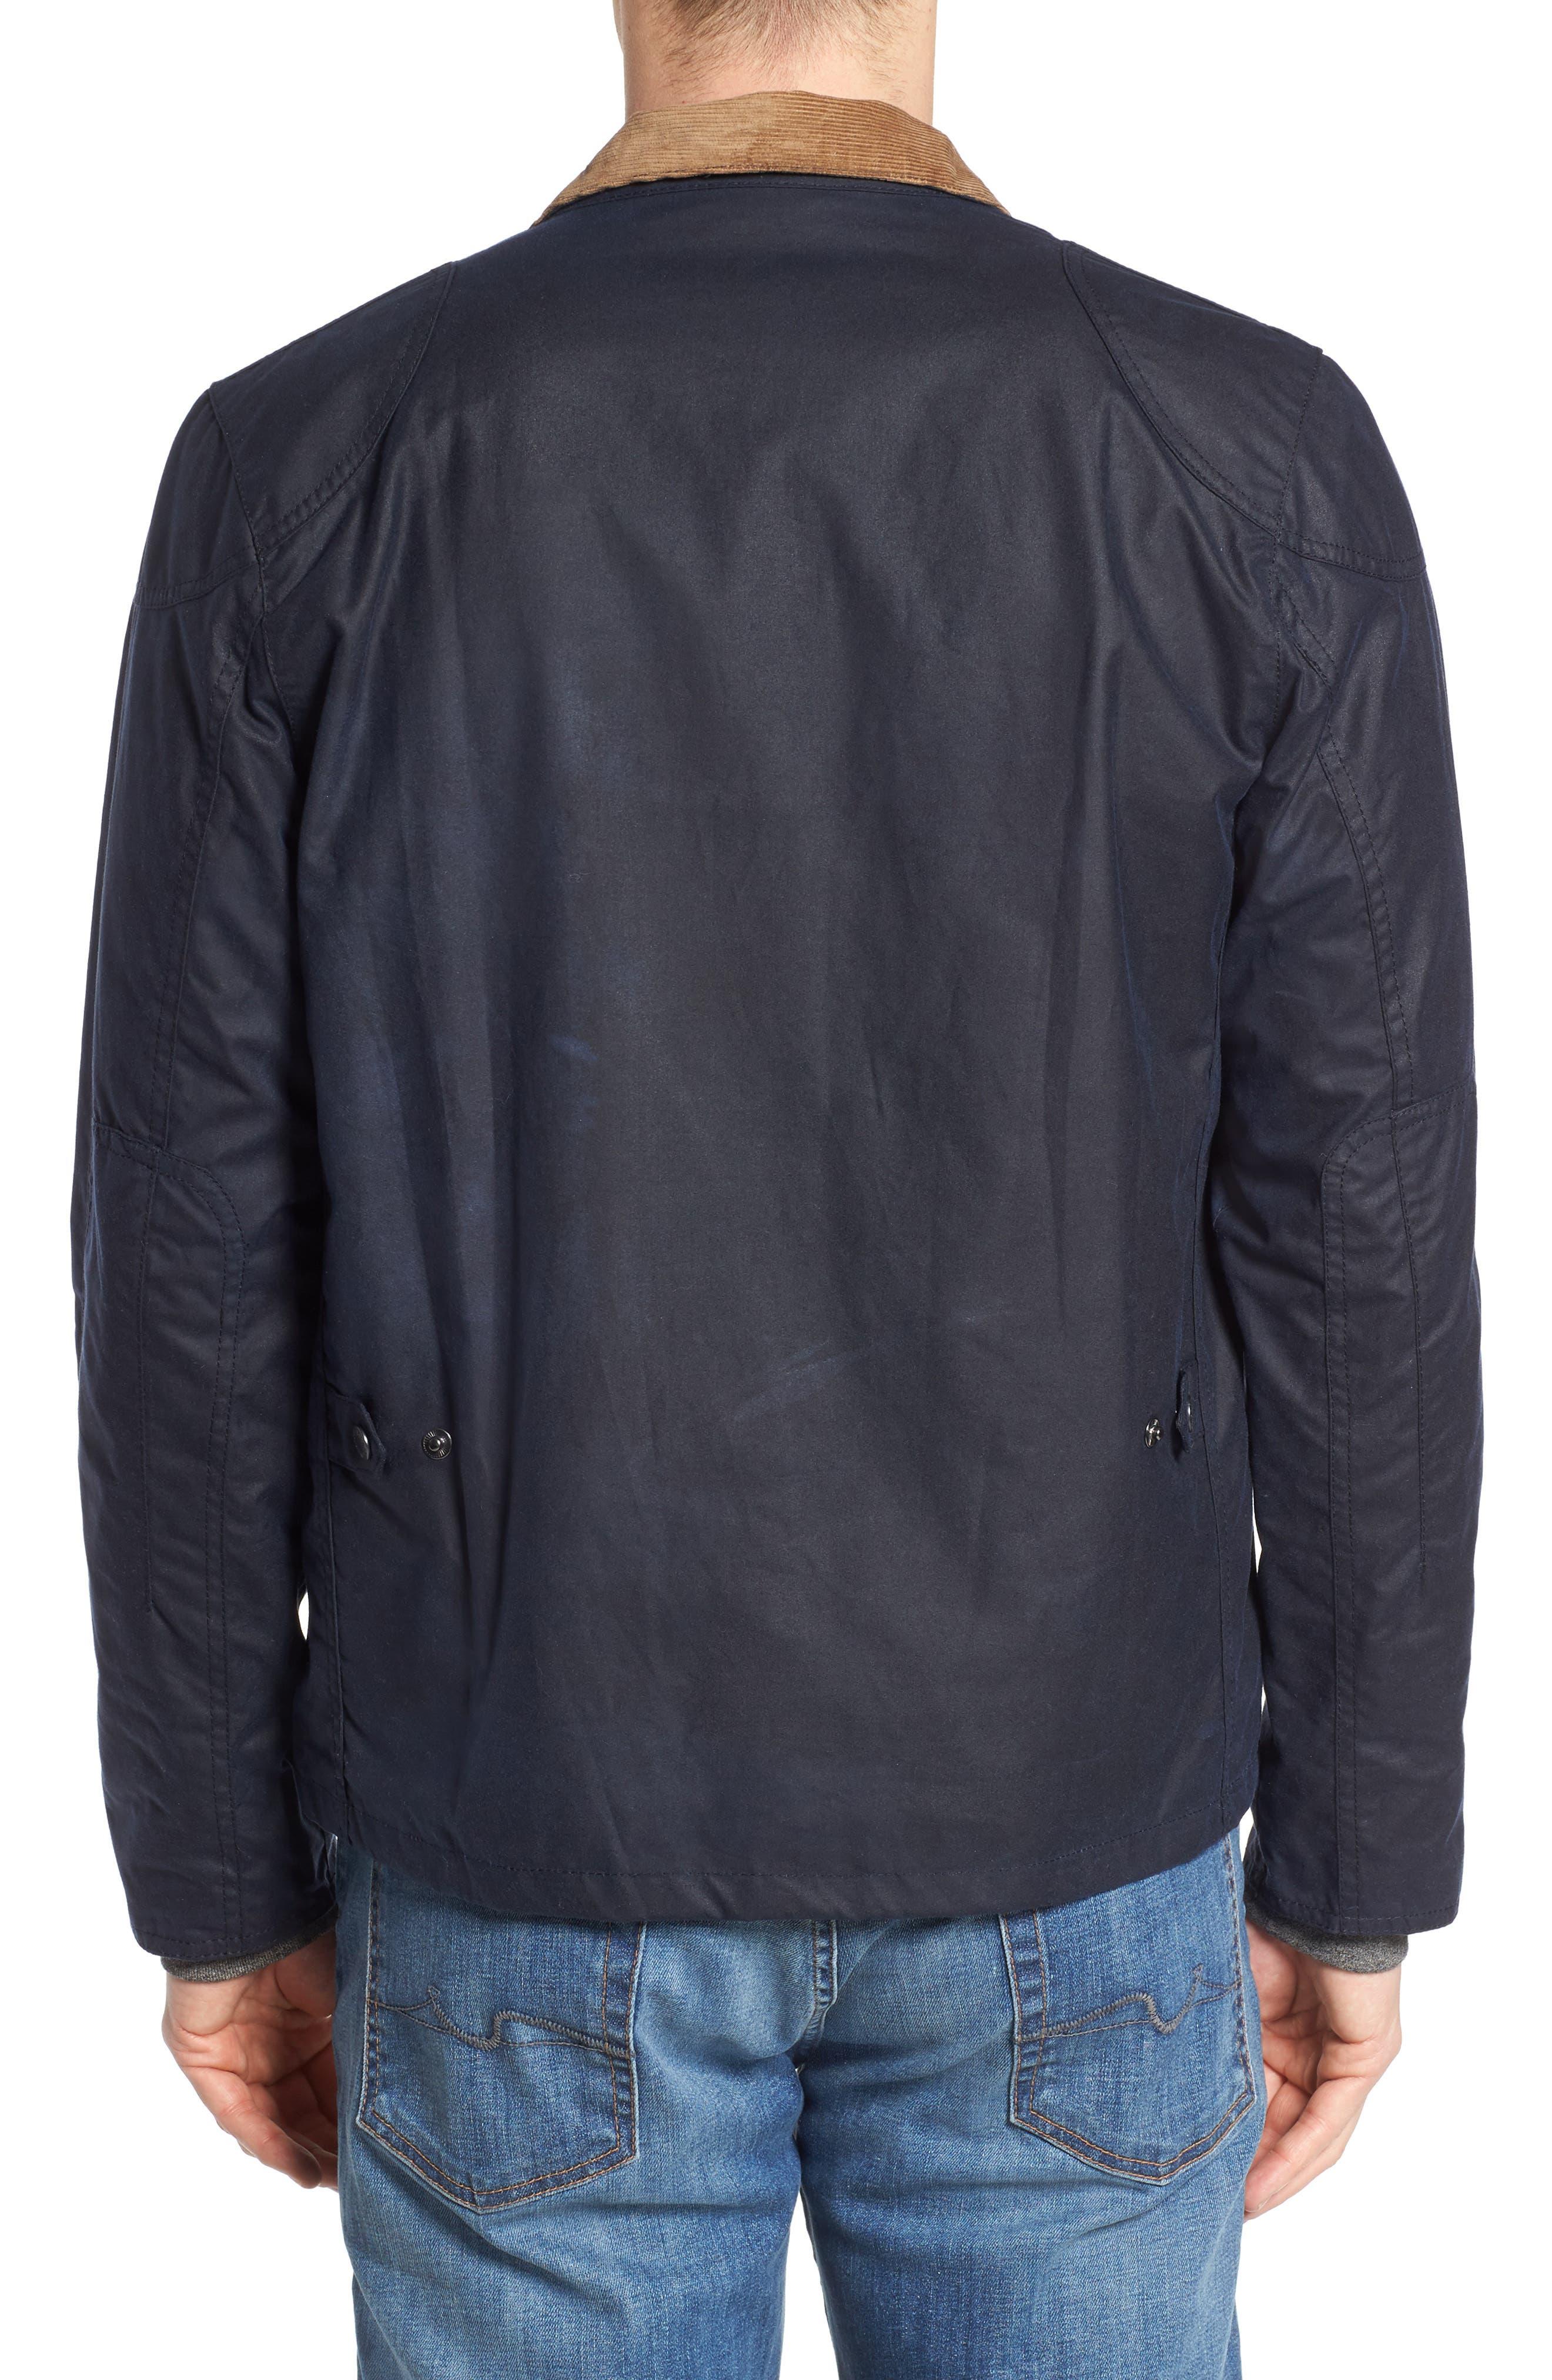 Lomond Waxed Cotton Jacket,                             Alternate thumbnail 2, color,                             410